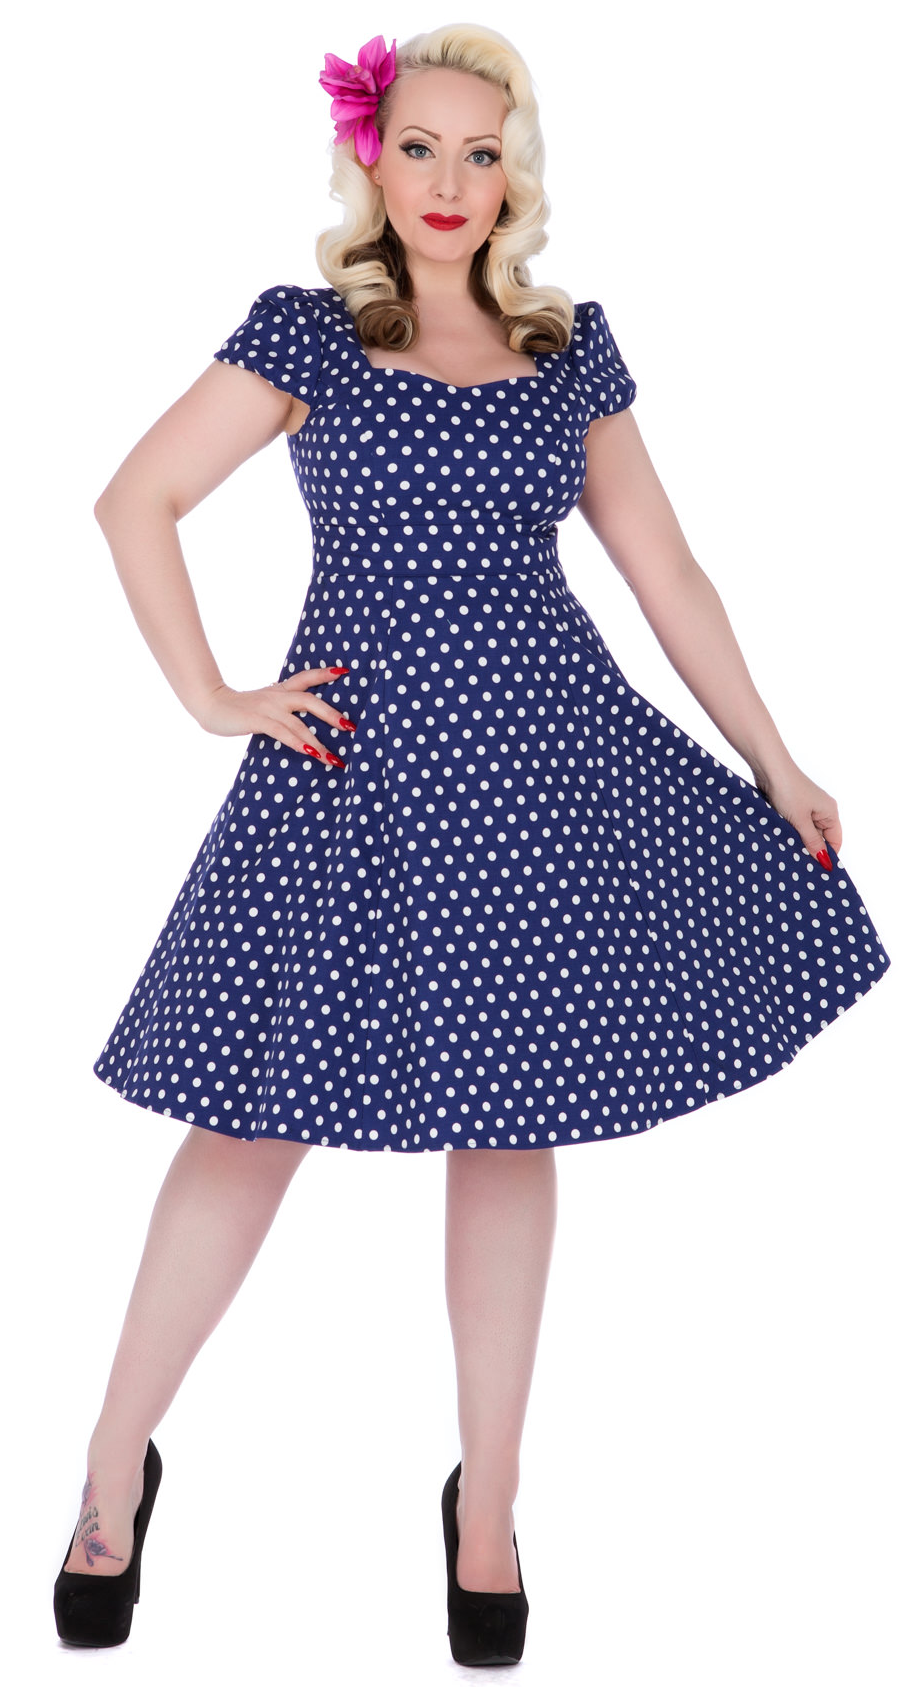 21a68c03f15c Claudia Flirty Fifties Style Dress in Dark Blue - New In!Artboard 1